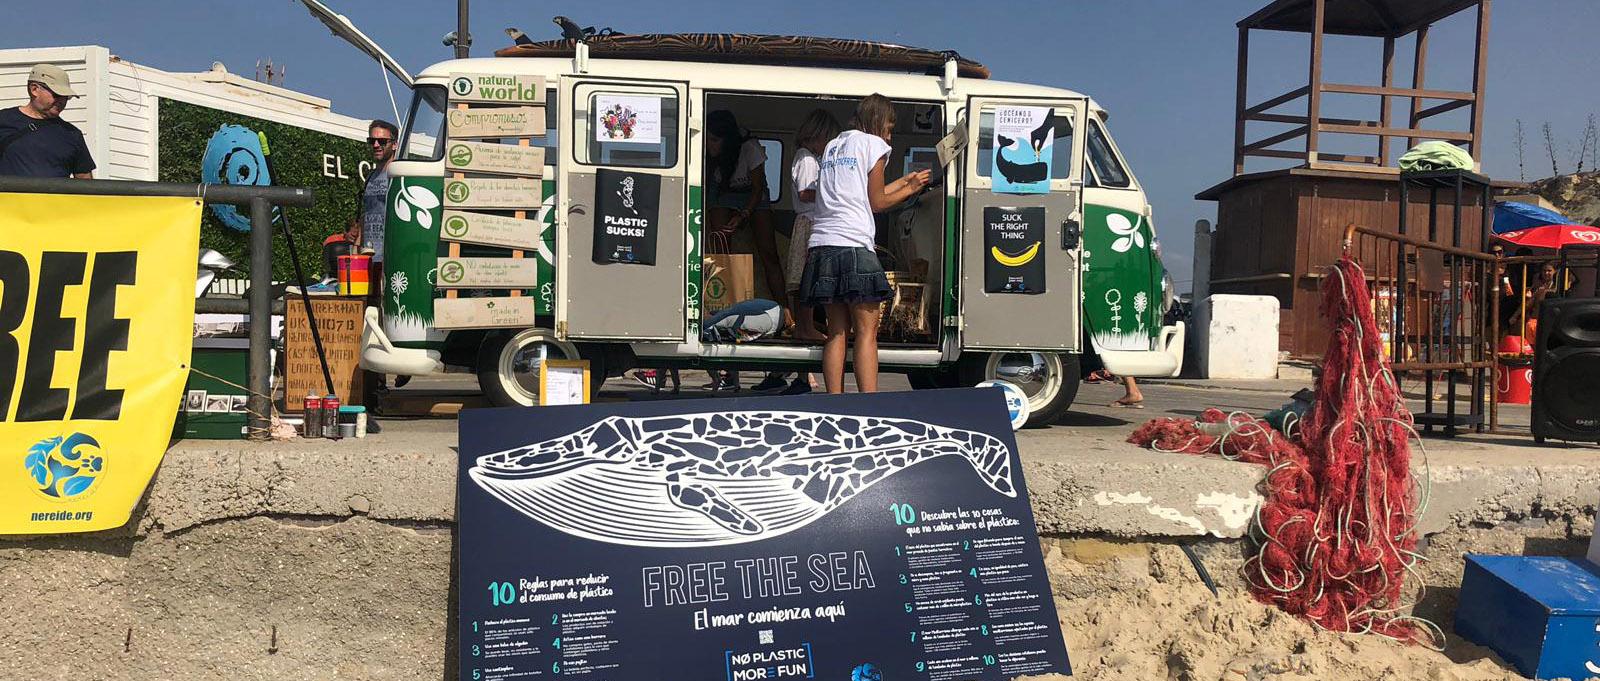 Furgoneta Natural World en la playa de tarifa